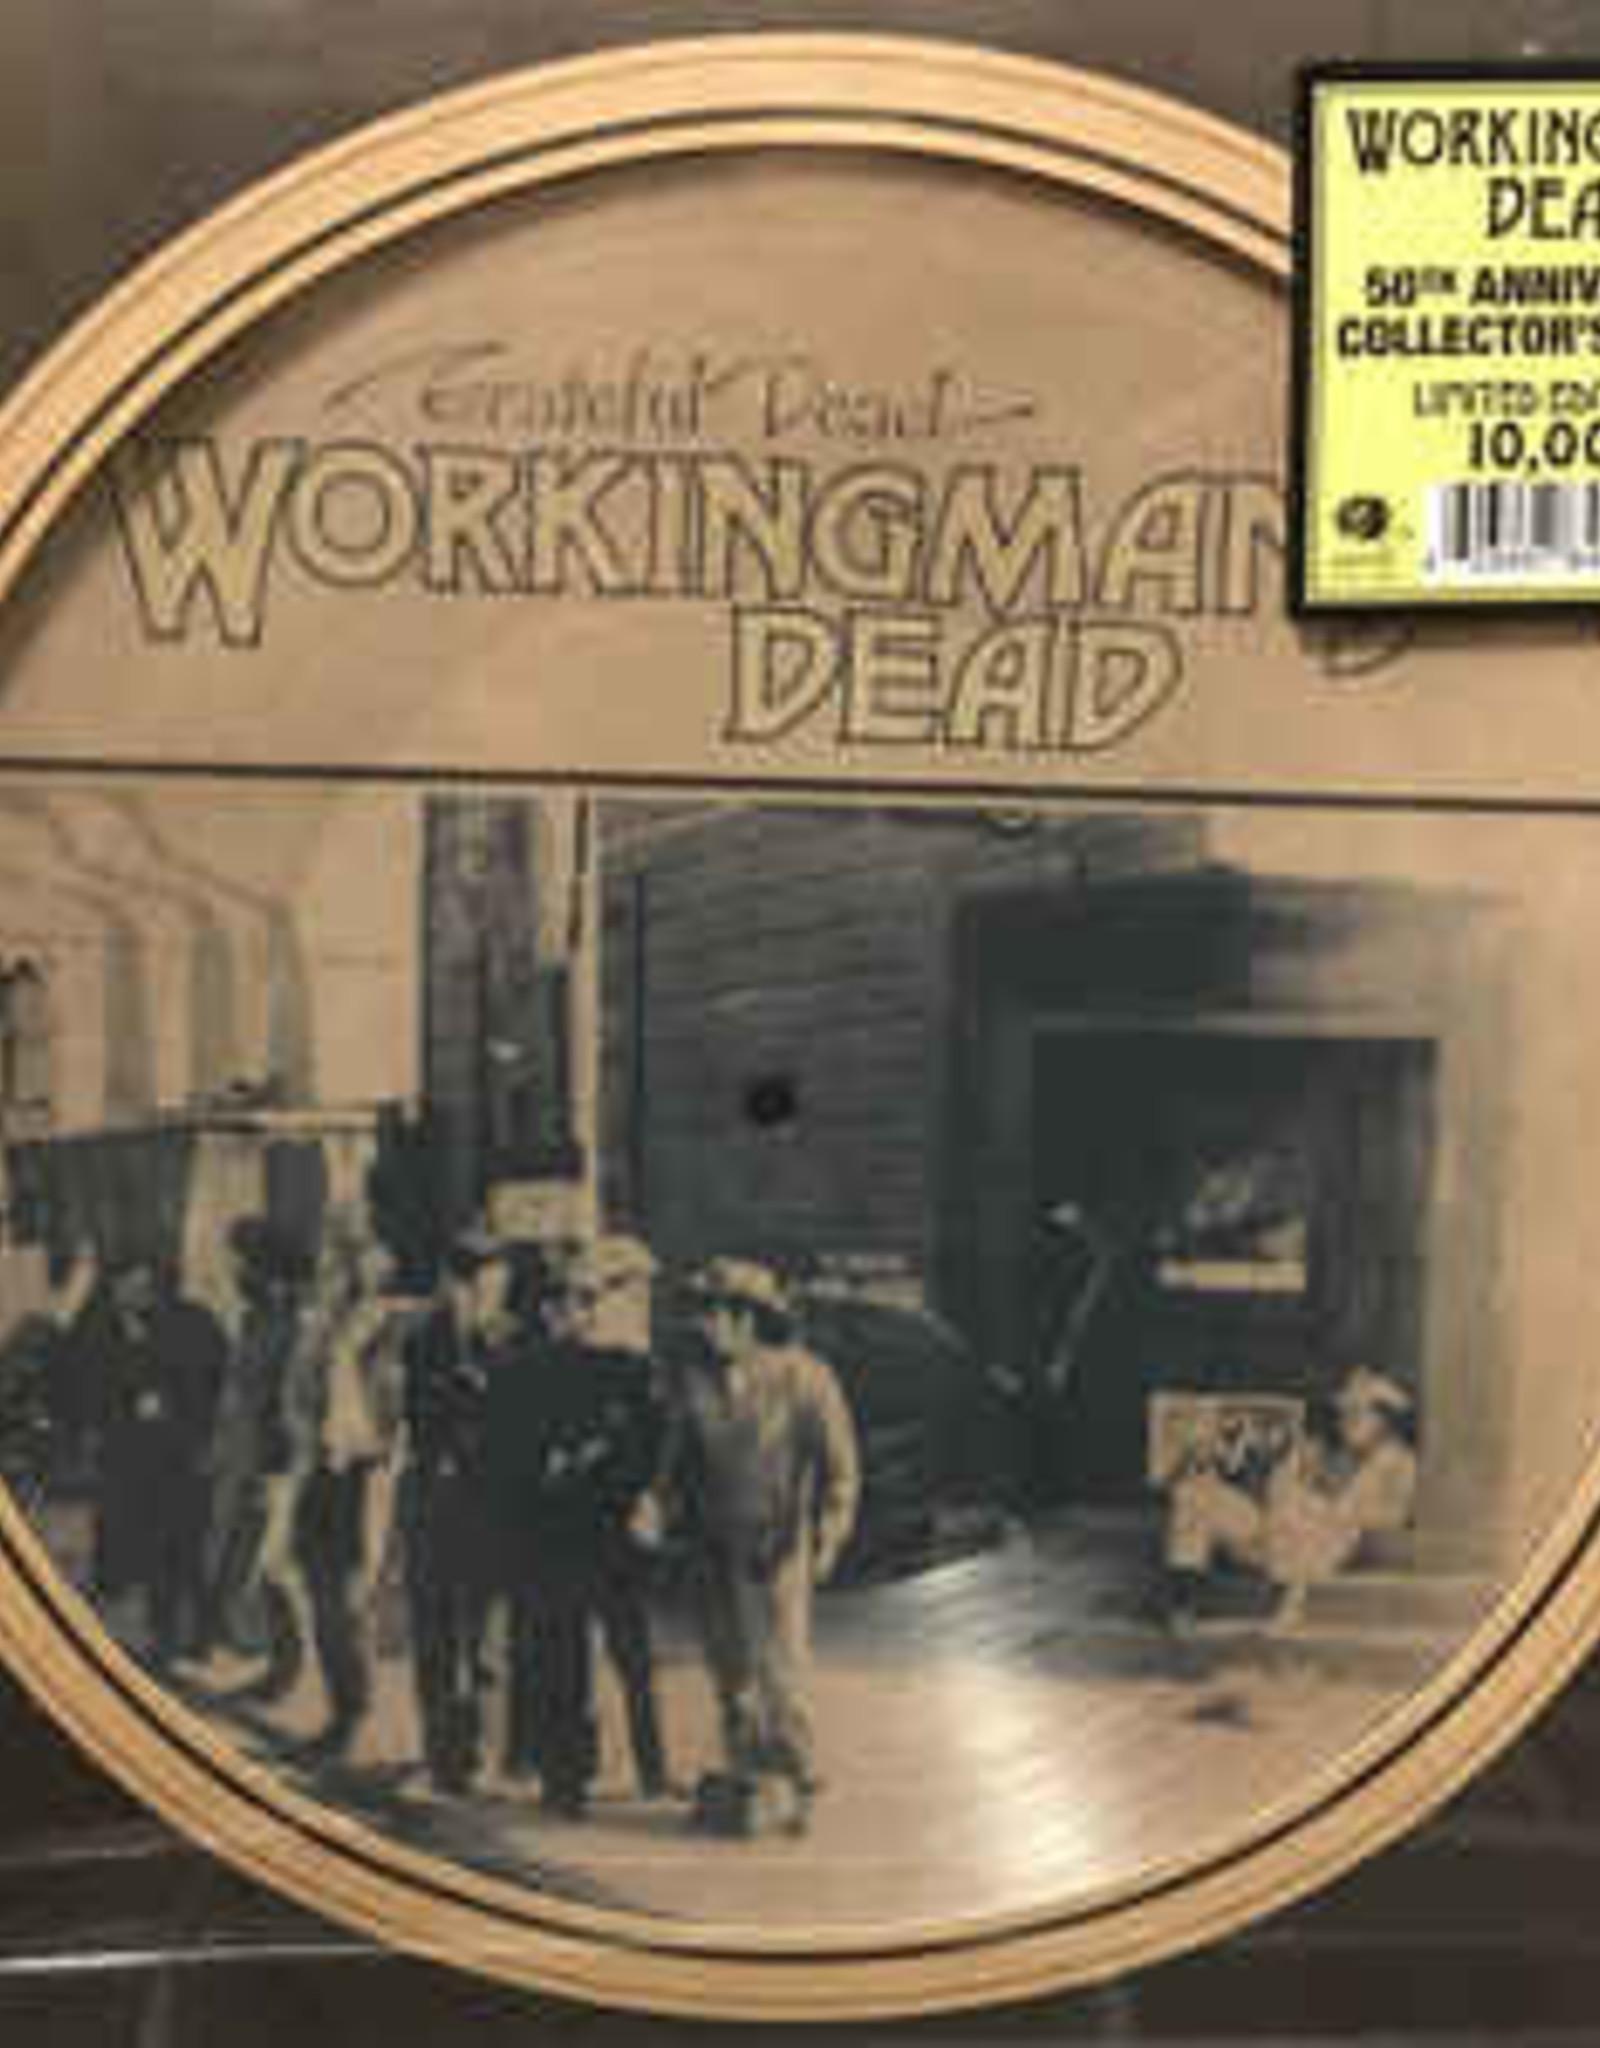 Grateful Dead / Workingman's Dead (50th Anniversary Picture Disc)